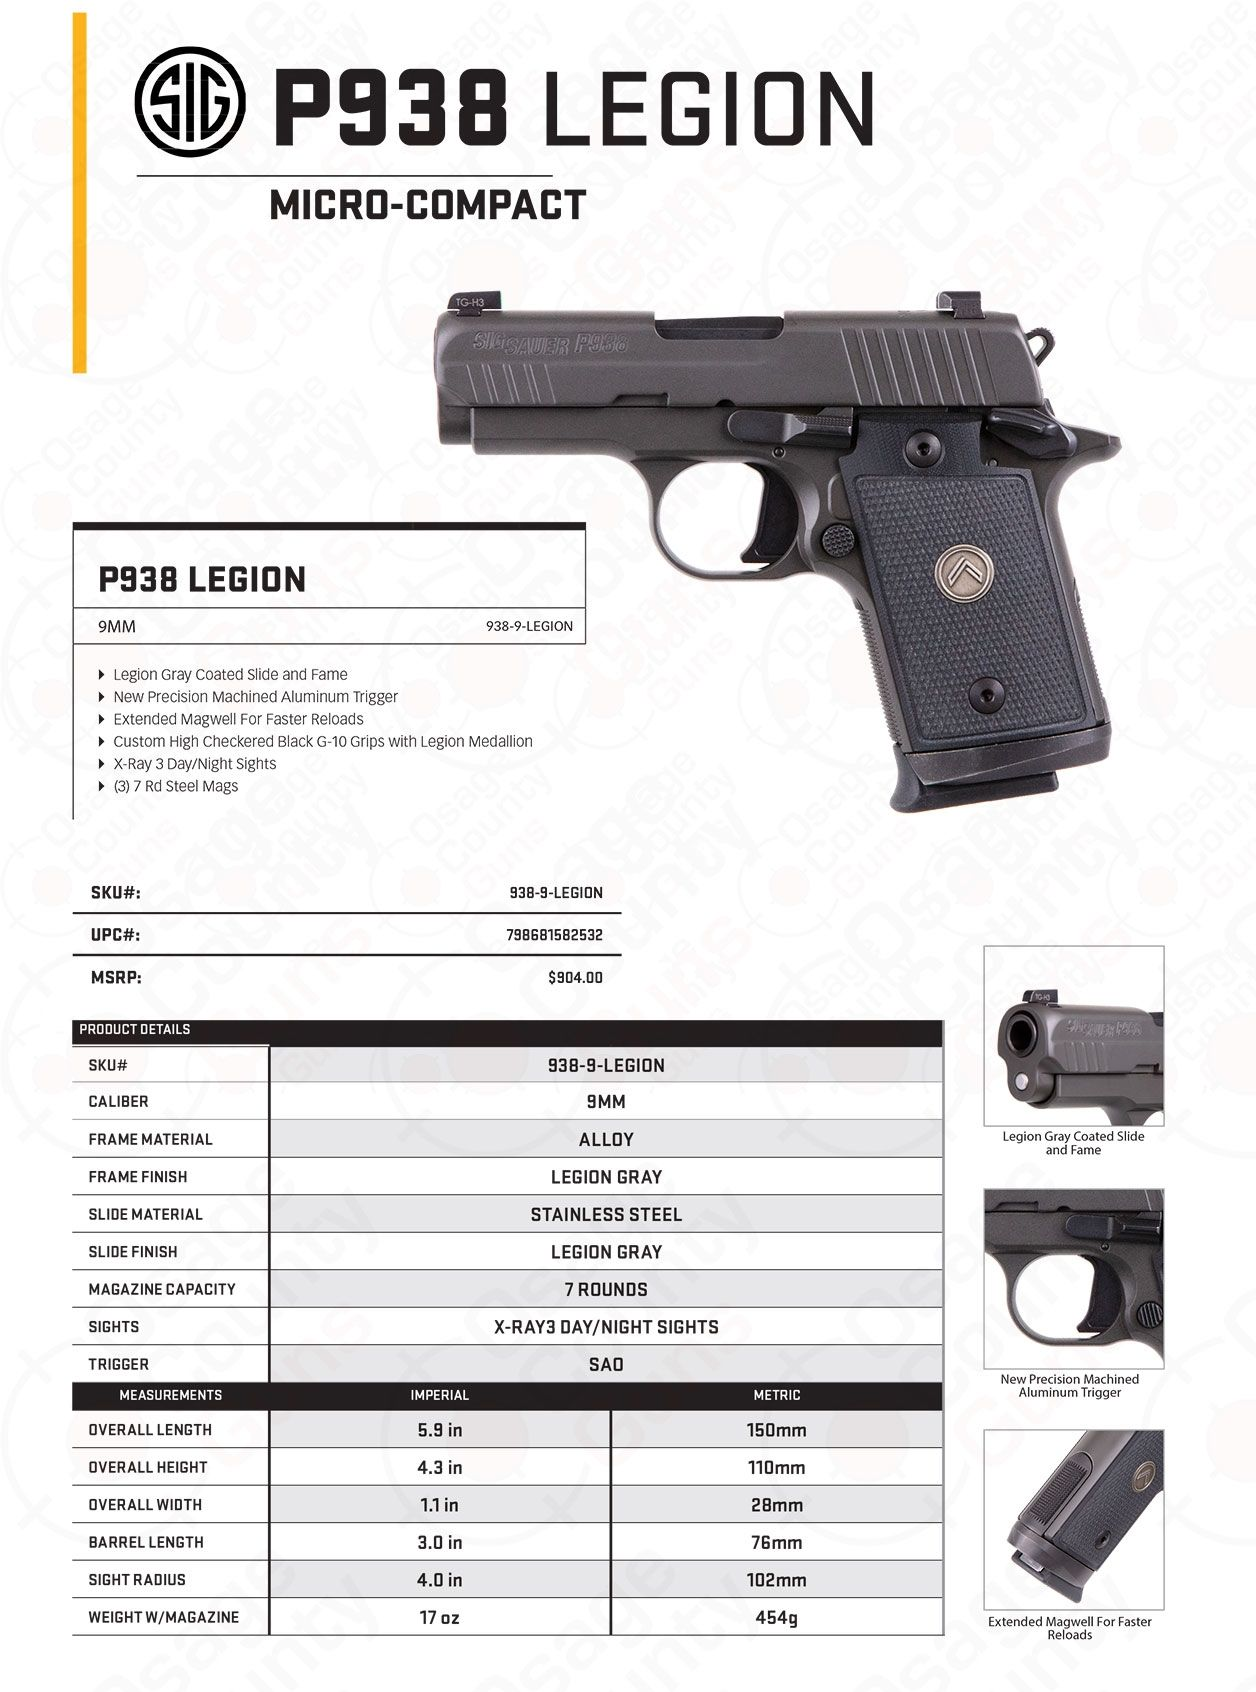 Sig P938 Legion Sell Sheet